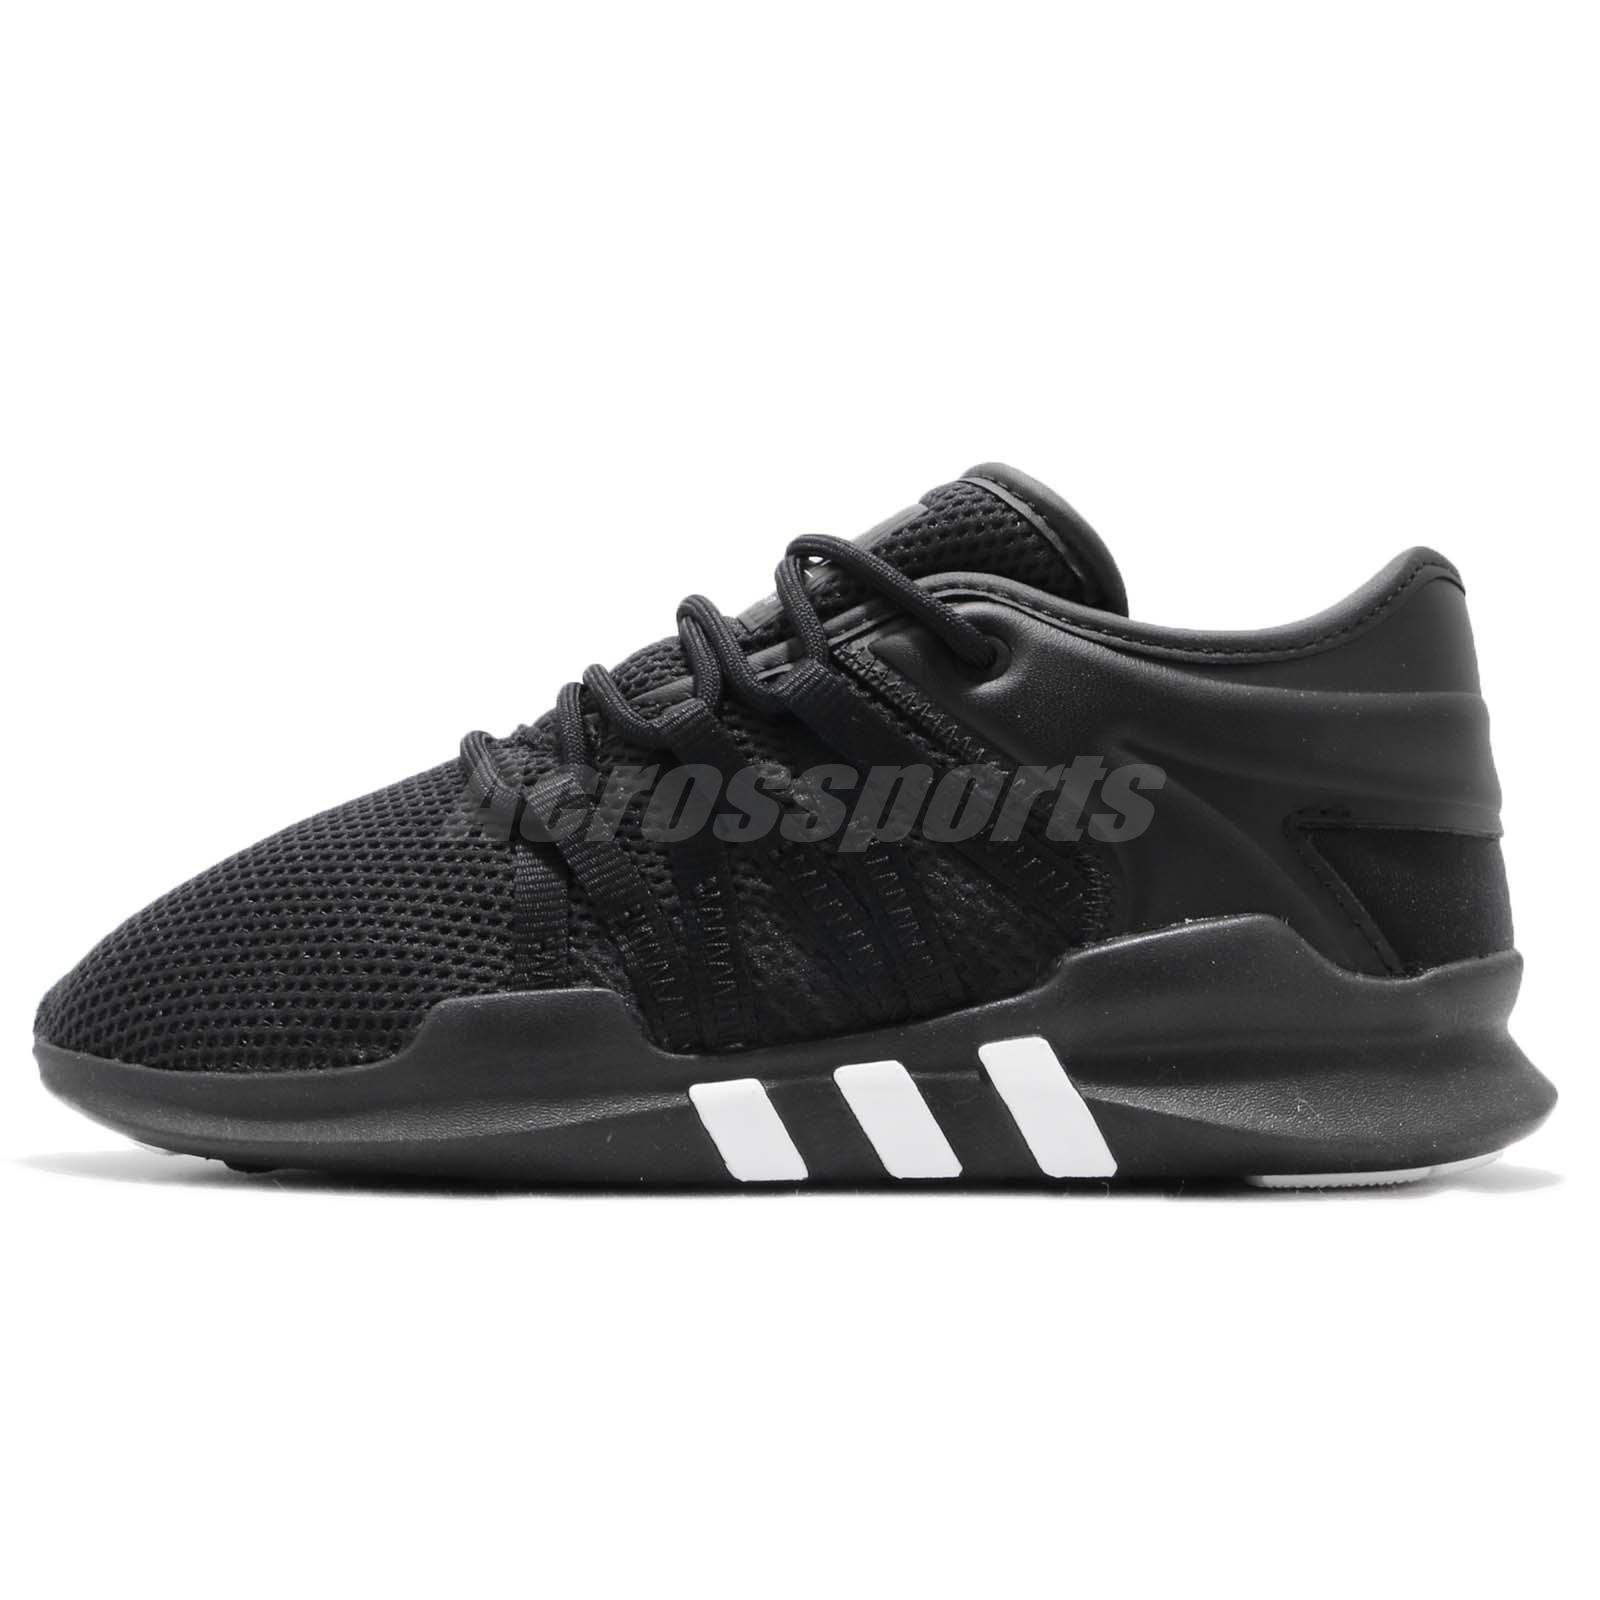 purchase cheap 936db b52e4 adidas Originals EQT Racing ADV W Core Black White Women Running Shoes  CQ2161